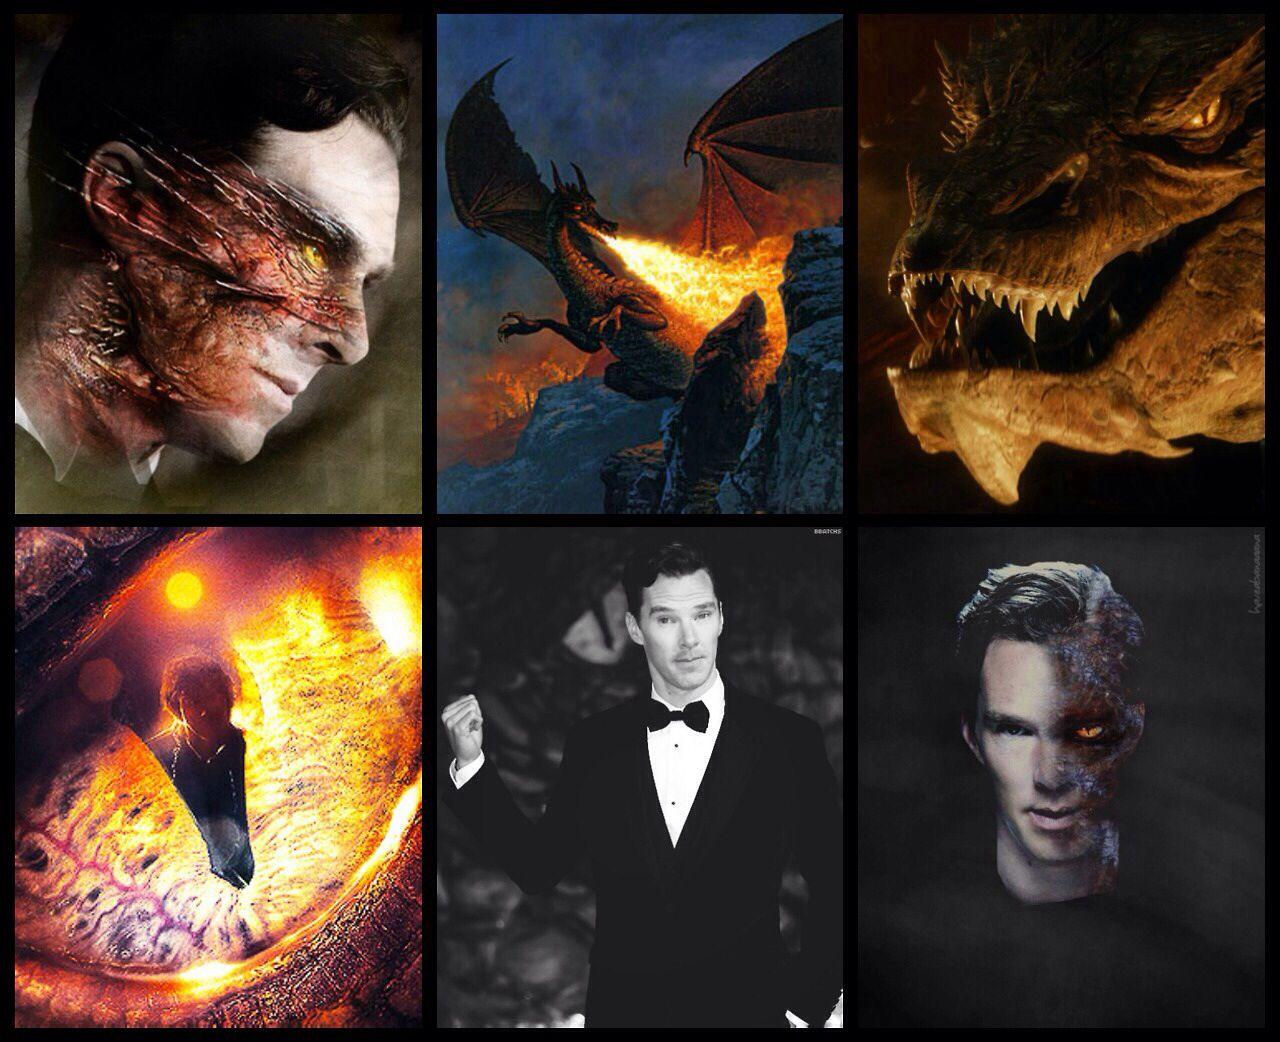 Benedict- Smaug/Necromancer | The hobbit movies, The ...